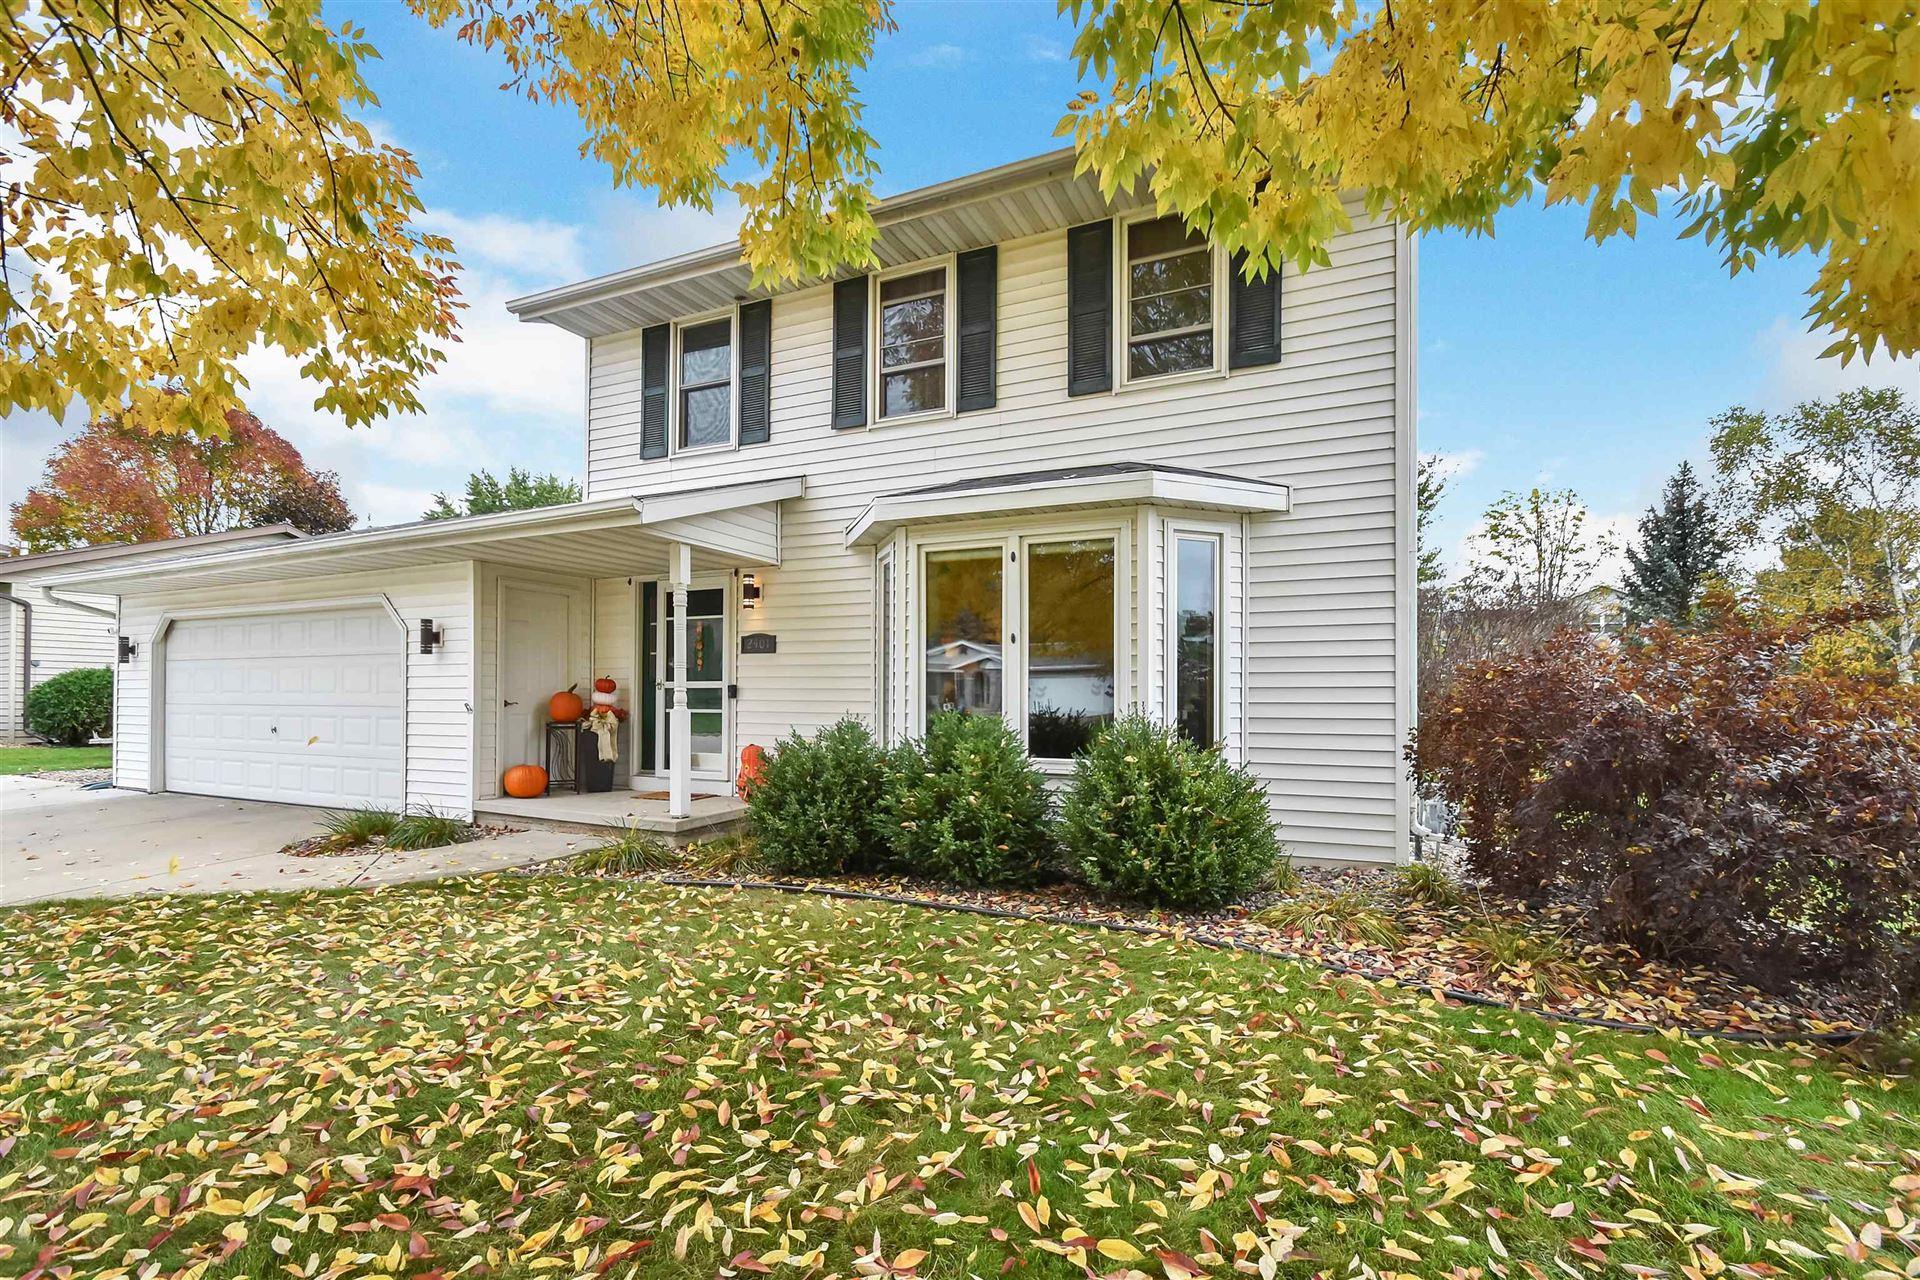 2401 E RIDGE Terrace, Green Bay, WI 54311 - MLS#: 50249608